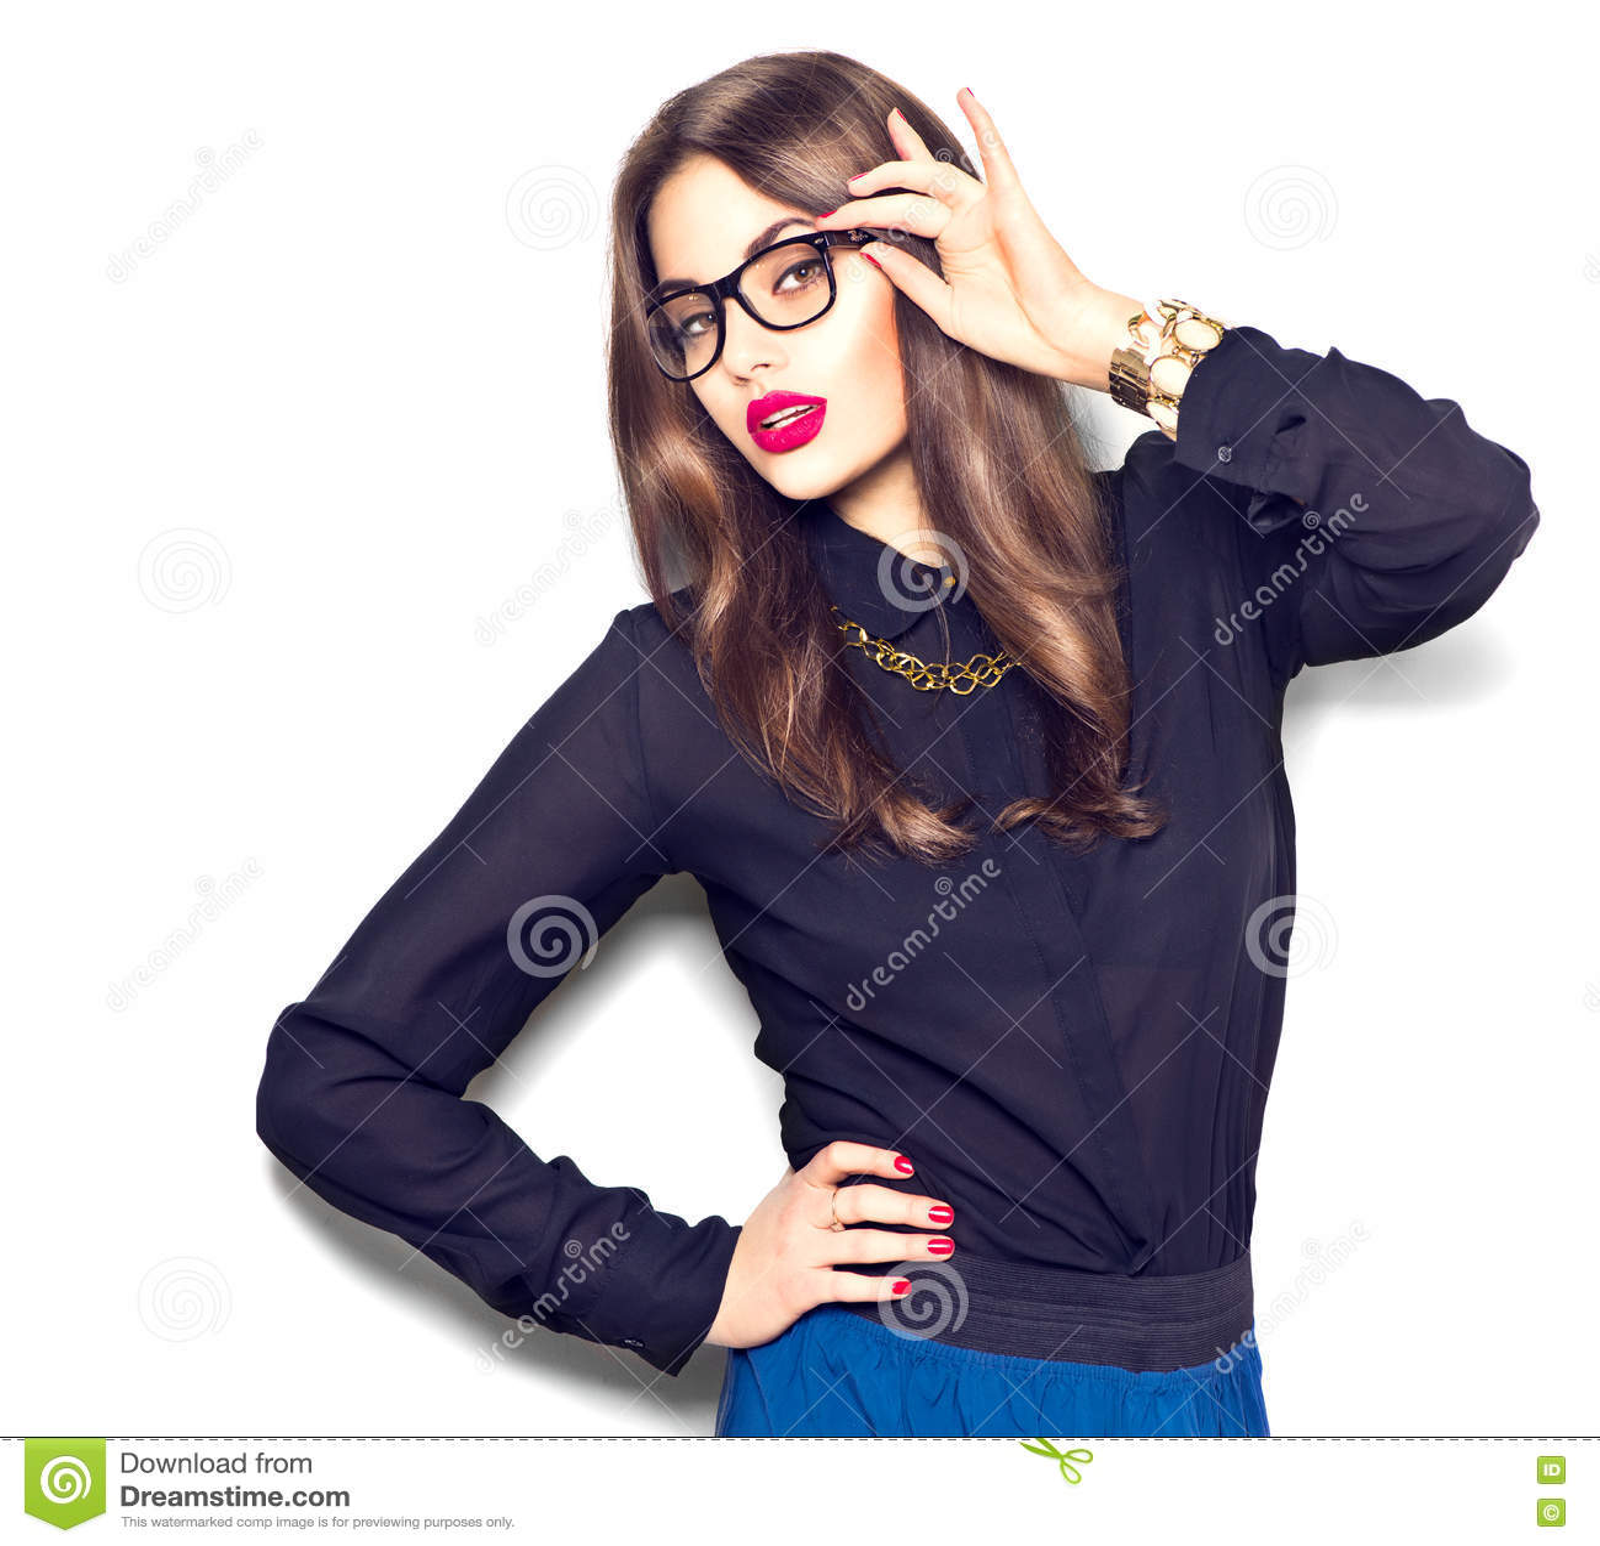 1c1b984b1 Beauty fashion model girl wearing glasses, isolated on white background